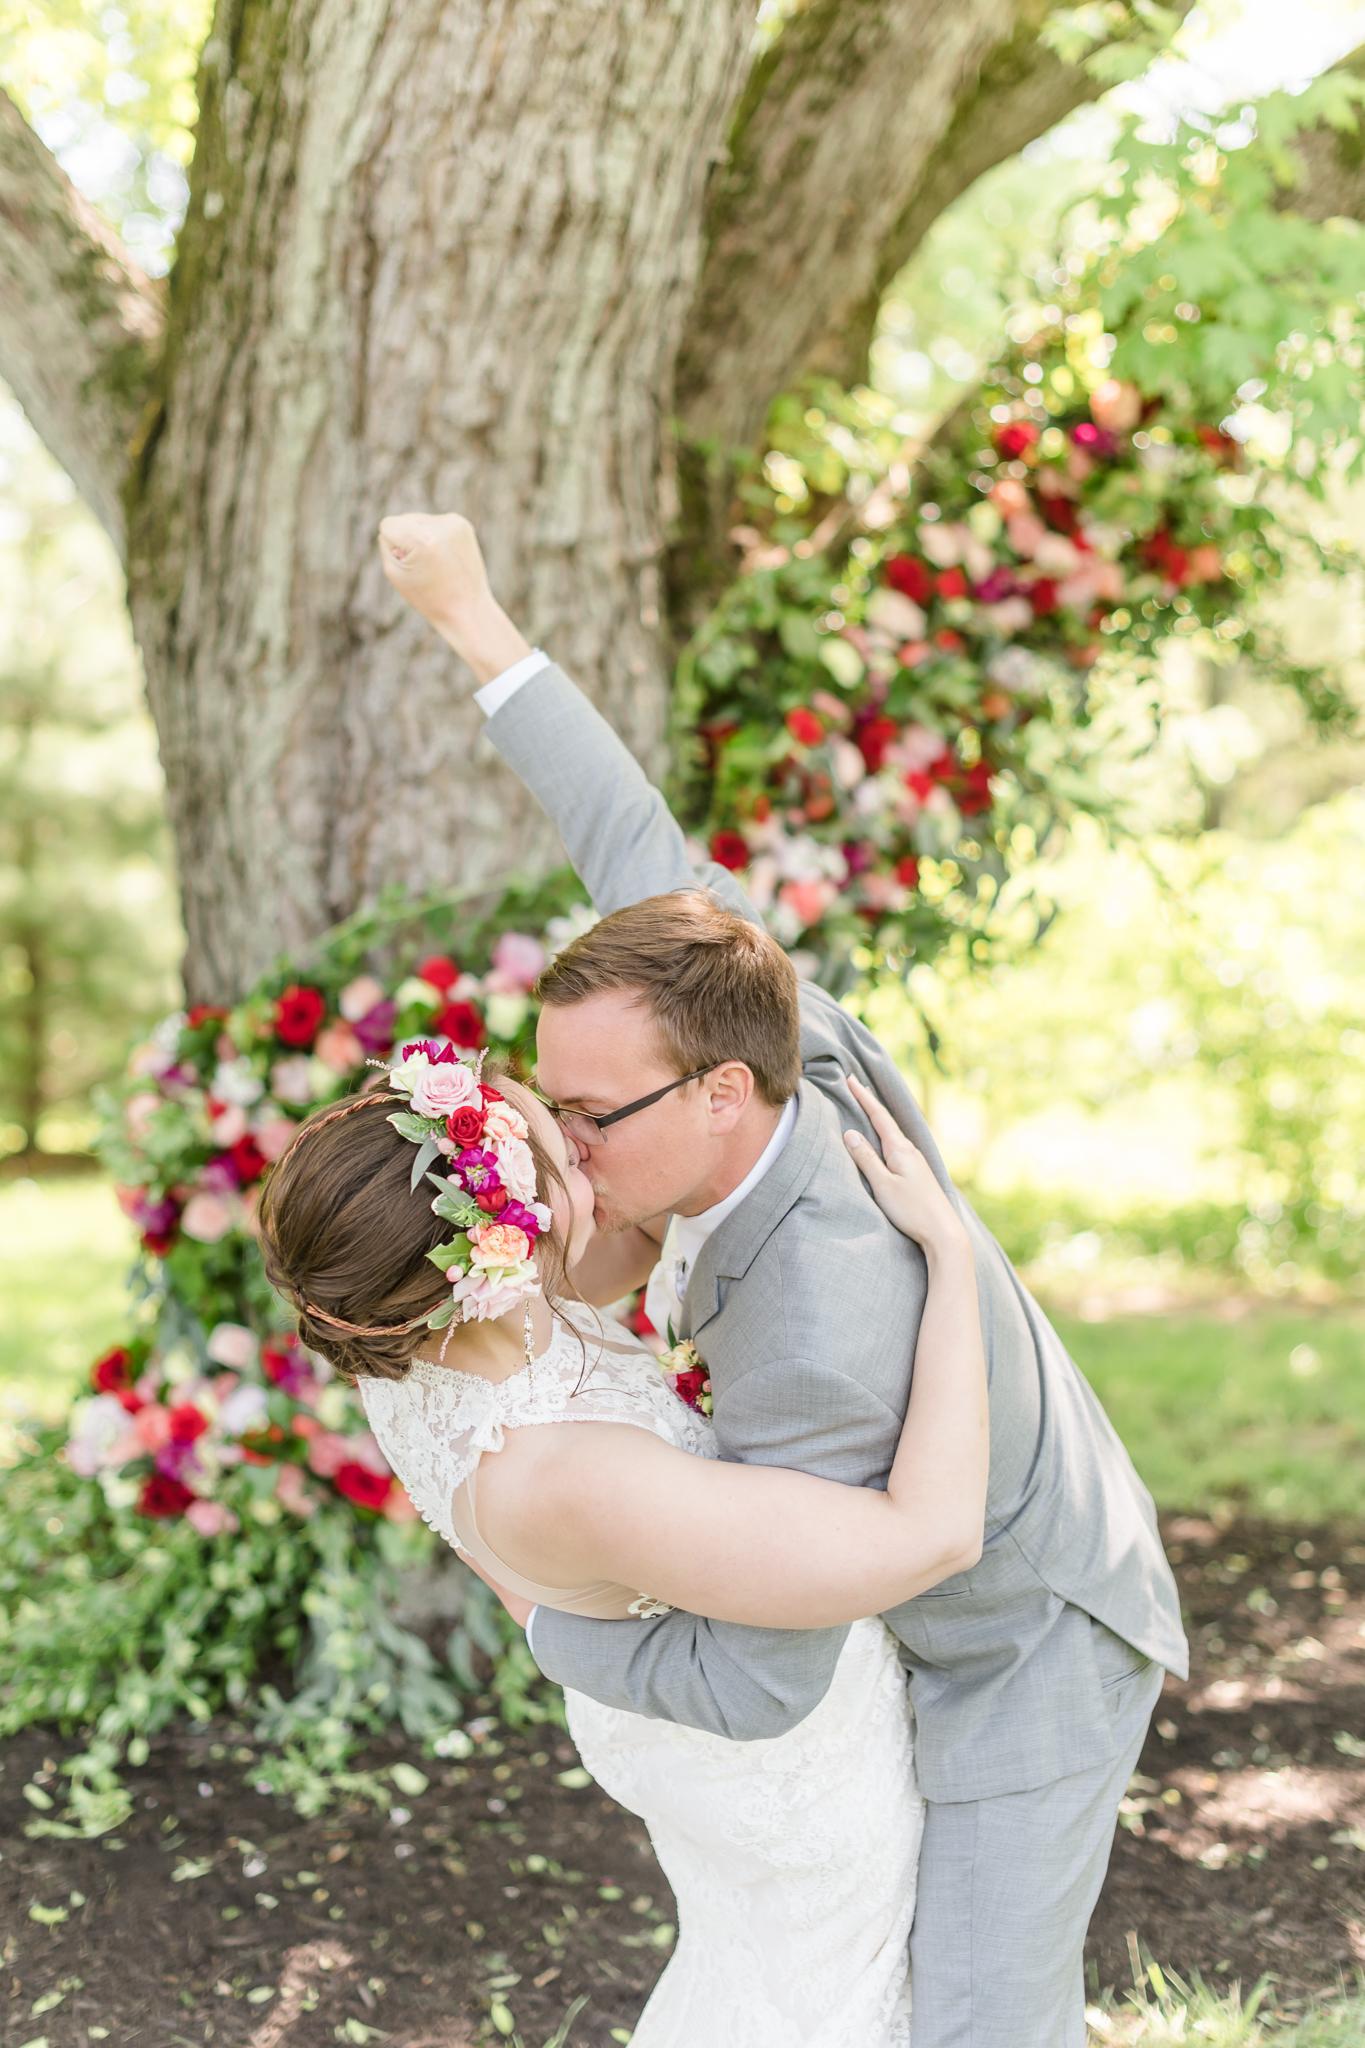 Mustard Seed Gardens Wedding Indianapolis Noblesvile Fishers Wedding Photographer-41.jpg